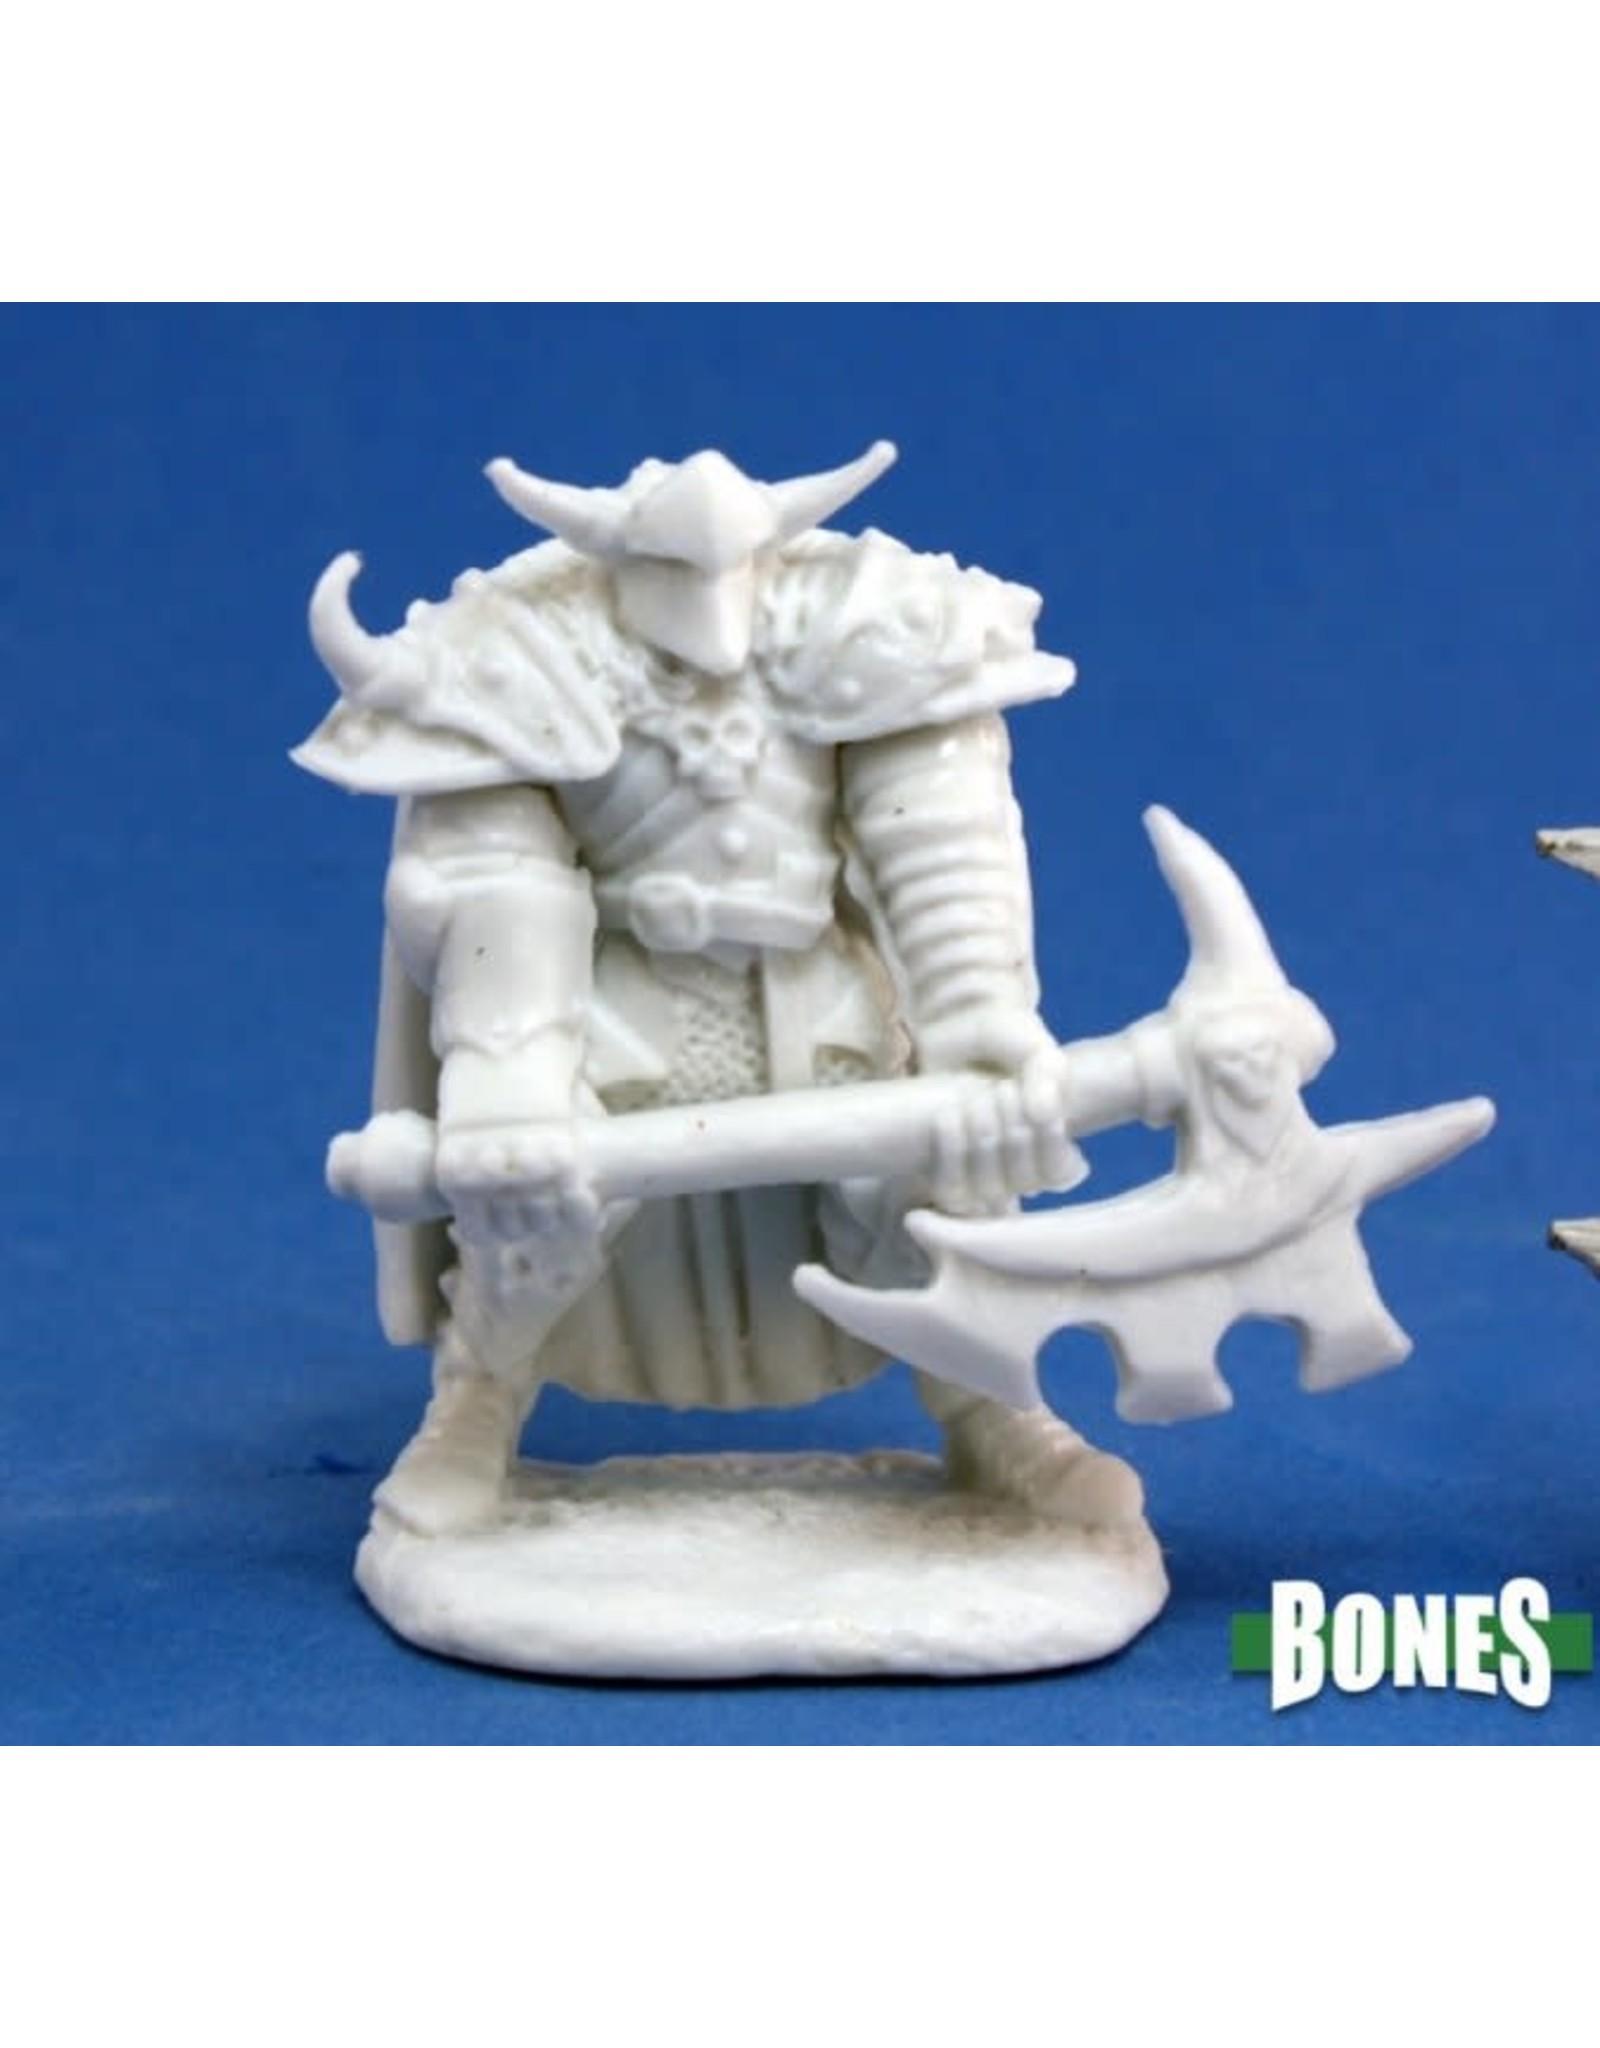 Reaper Miniatures Bones: Norgol, Irongrave Knight